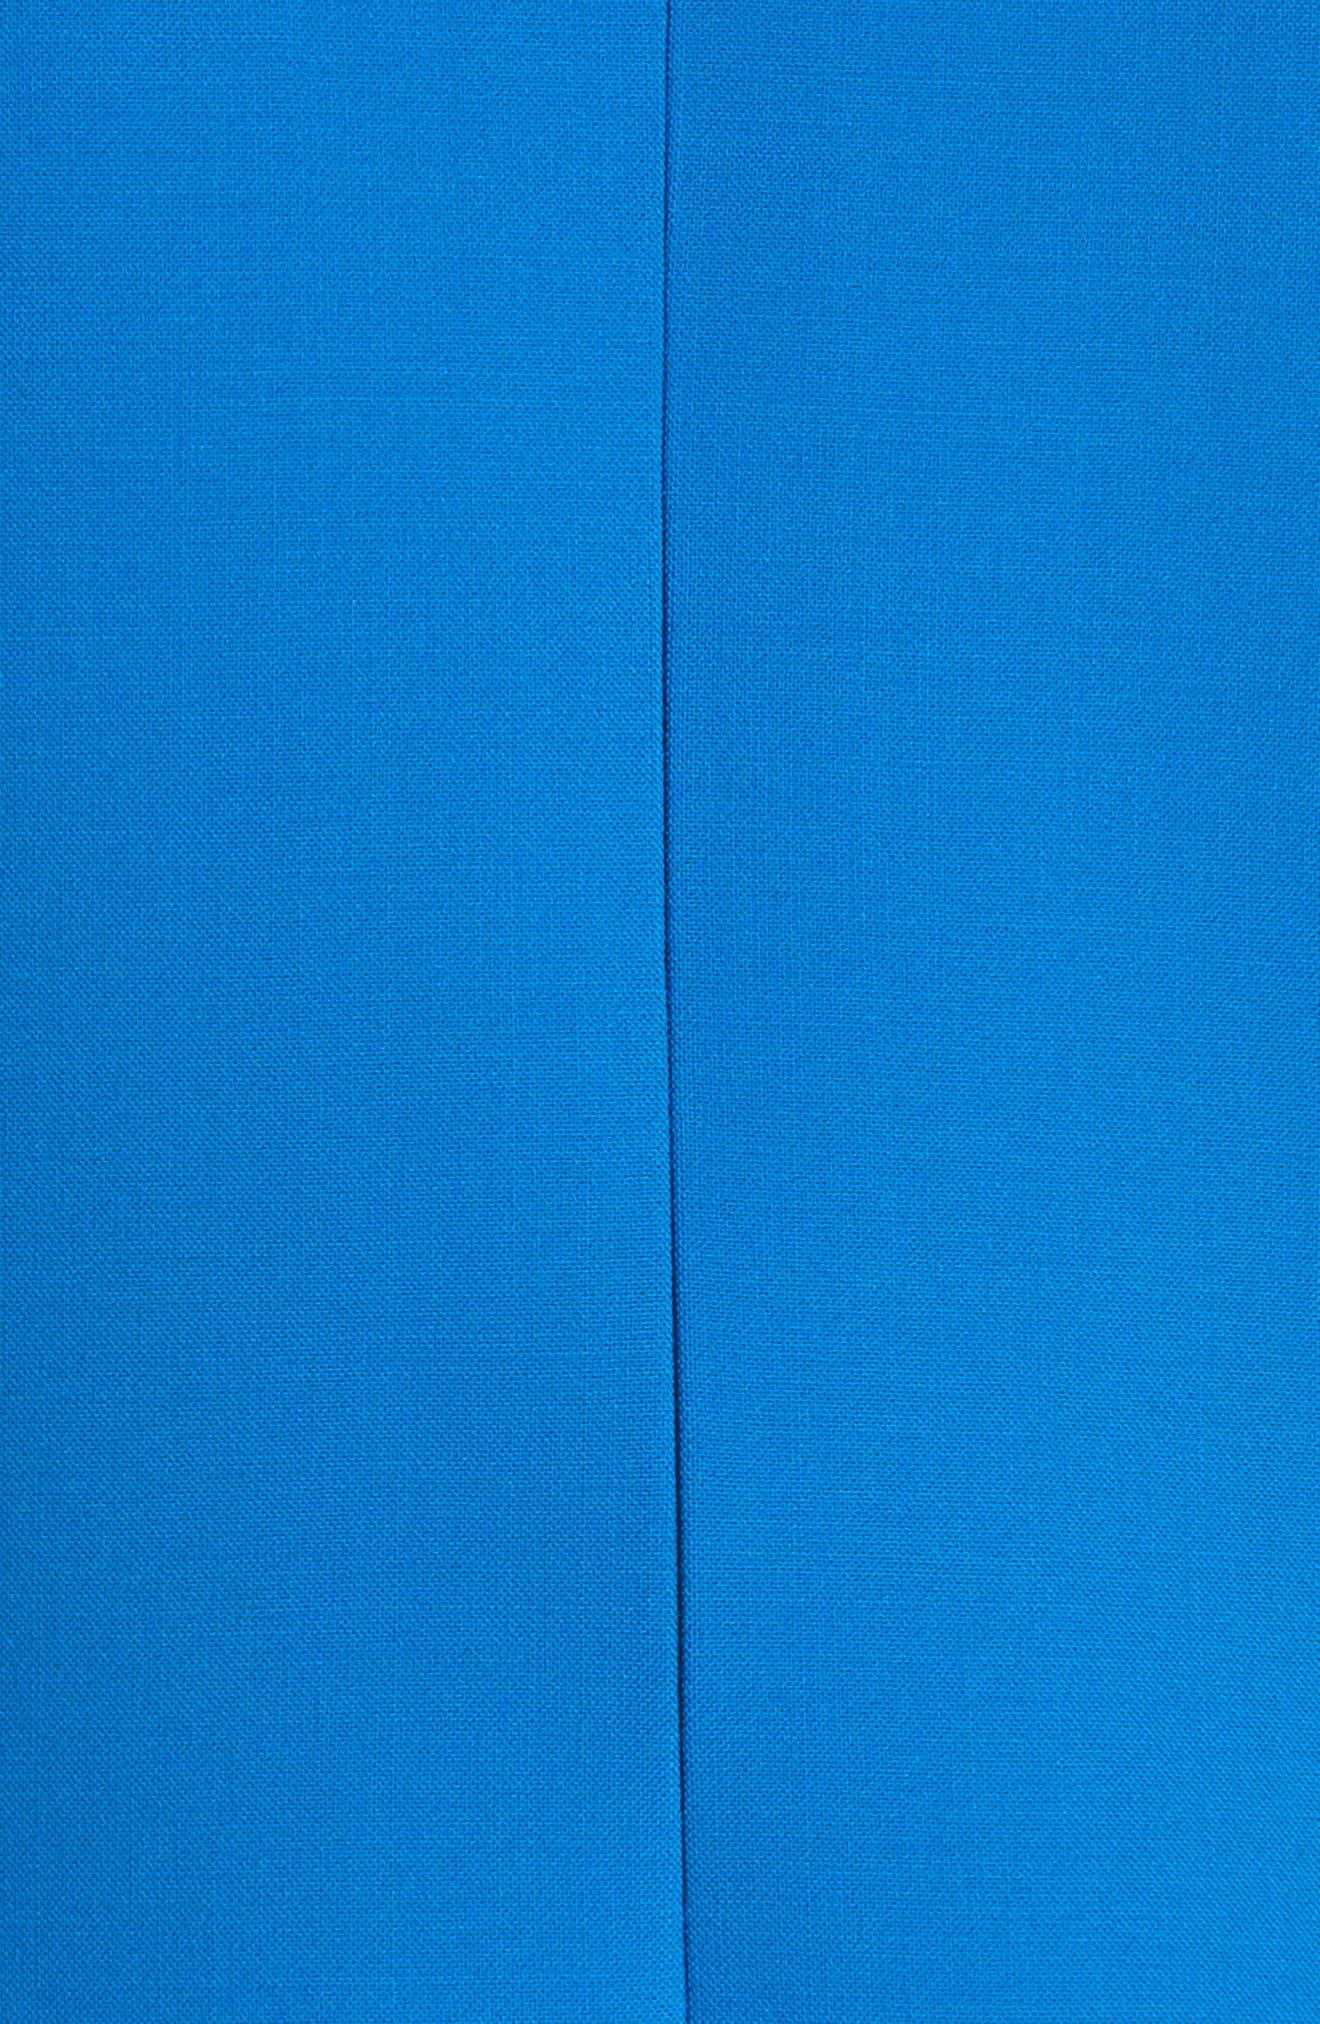 Flutter Hem Wool Blend Sheath Dress,                             Alternate thumbnail 6, color,                             Cobalt